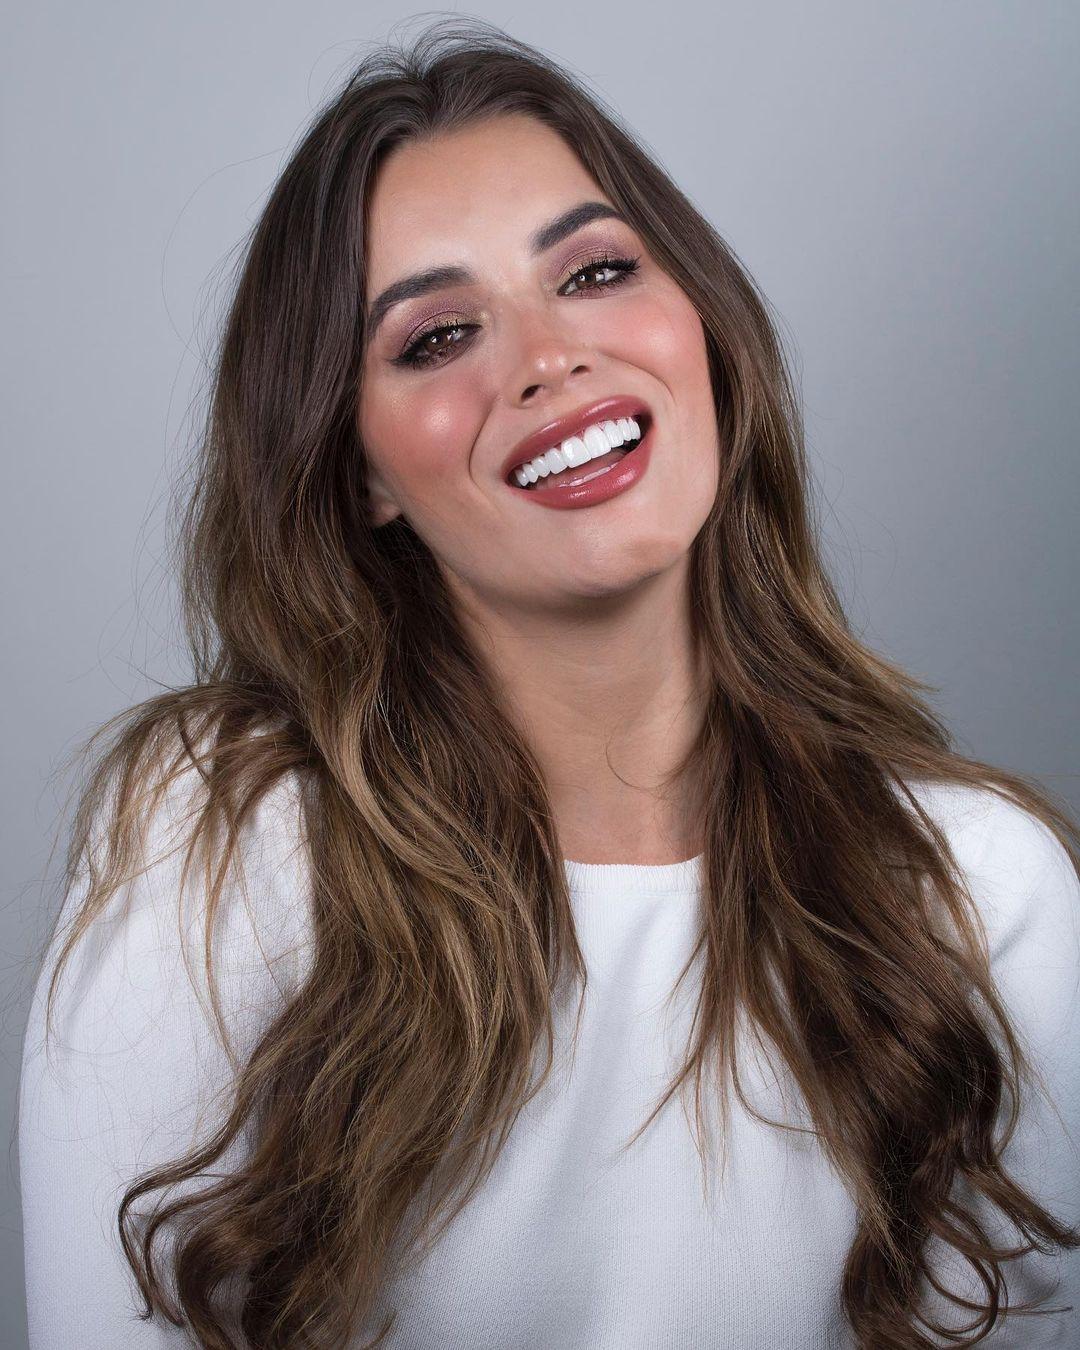 maria alejandra lopez perez, miss universe risaralda 2021/reyna hispanoamericana 2013/miss caraibes hibiscus 2014/miss colombia mundo 2015. 23242319